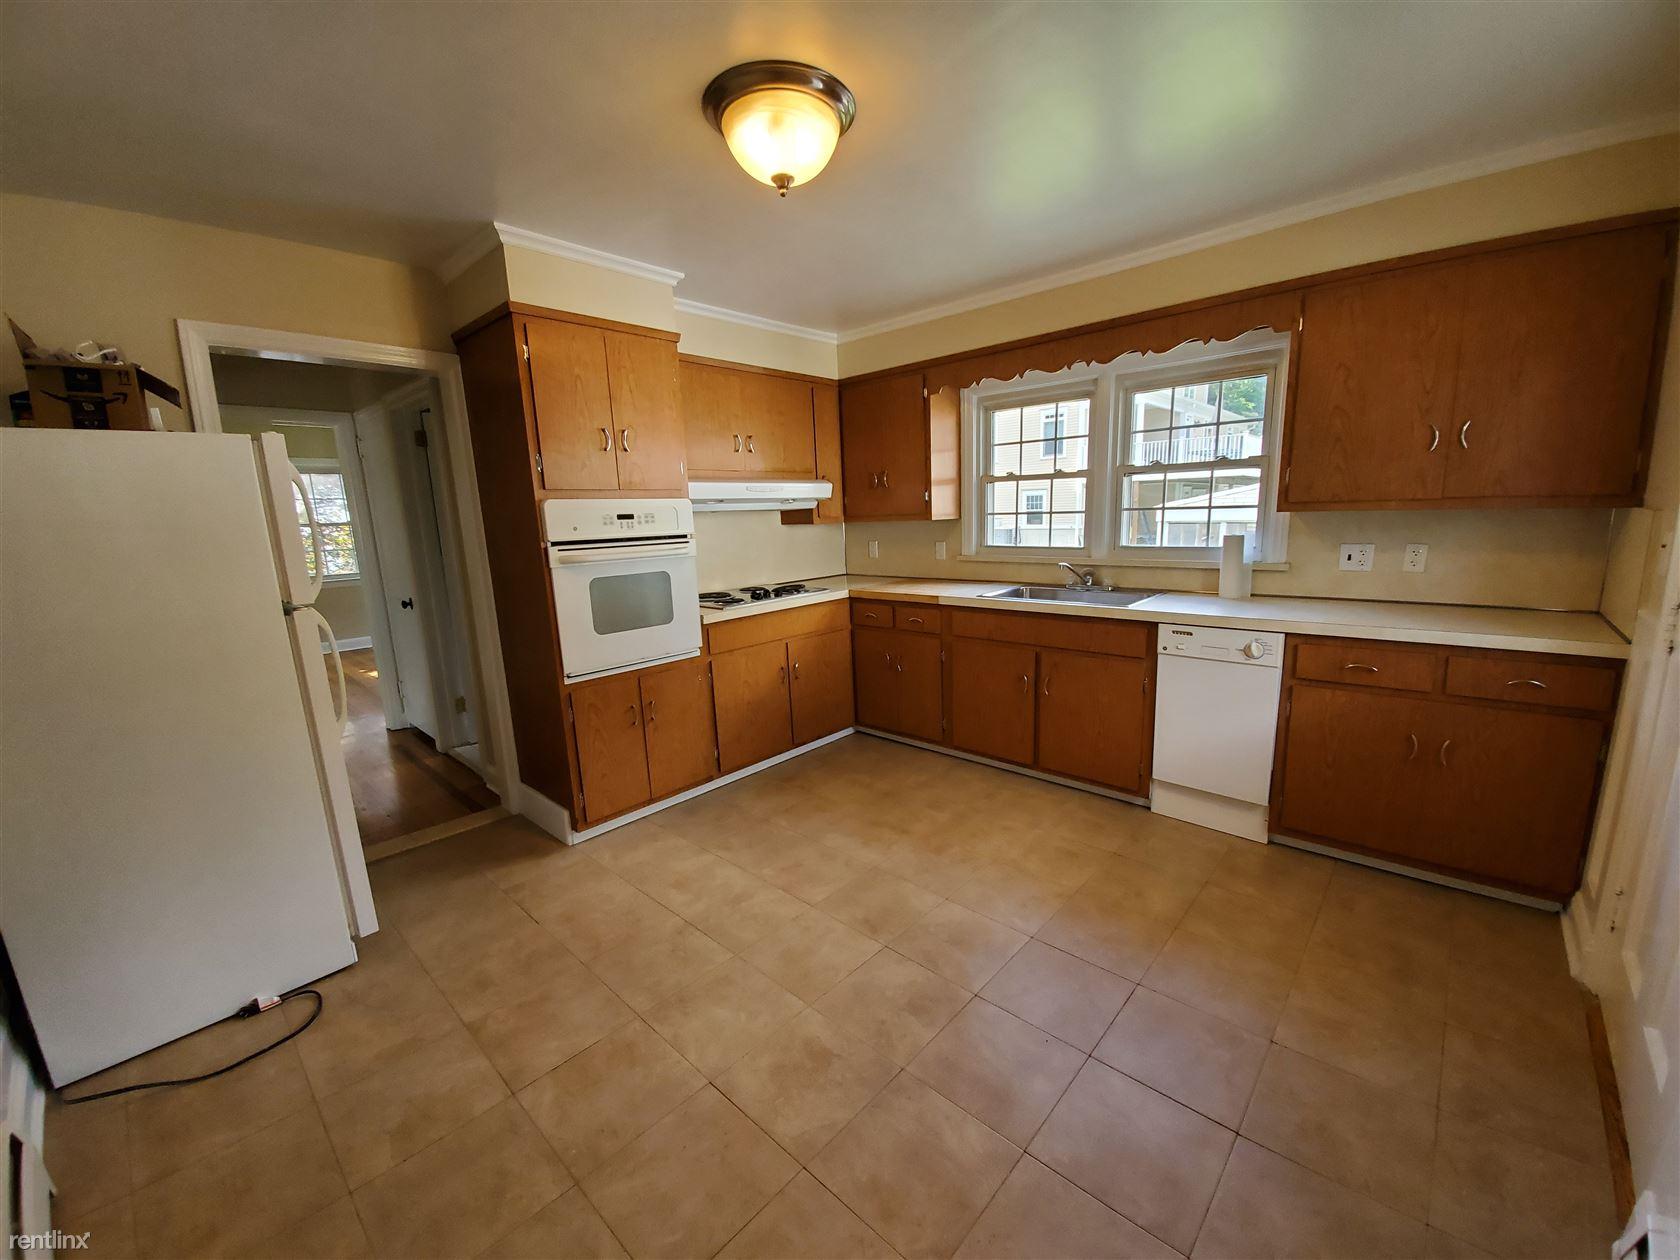 73 Turner Rd, Stamford, CT - 2,700 USD/ month